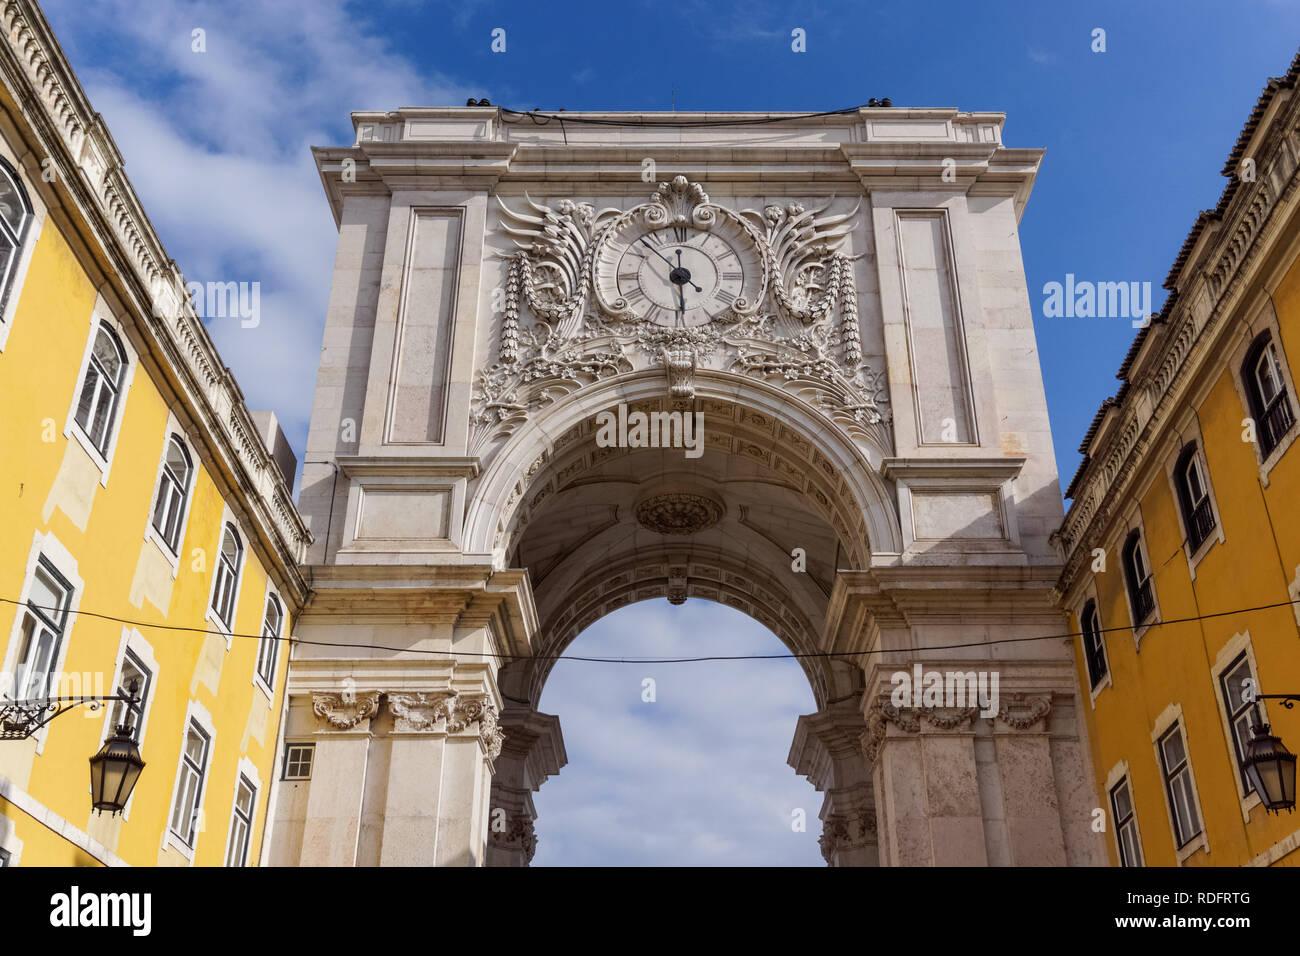 The Rua Augusta Arch in Lisbon, Portugal - Stock Image